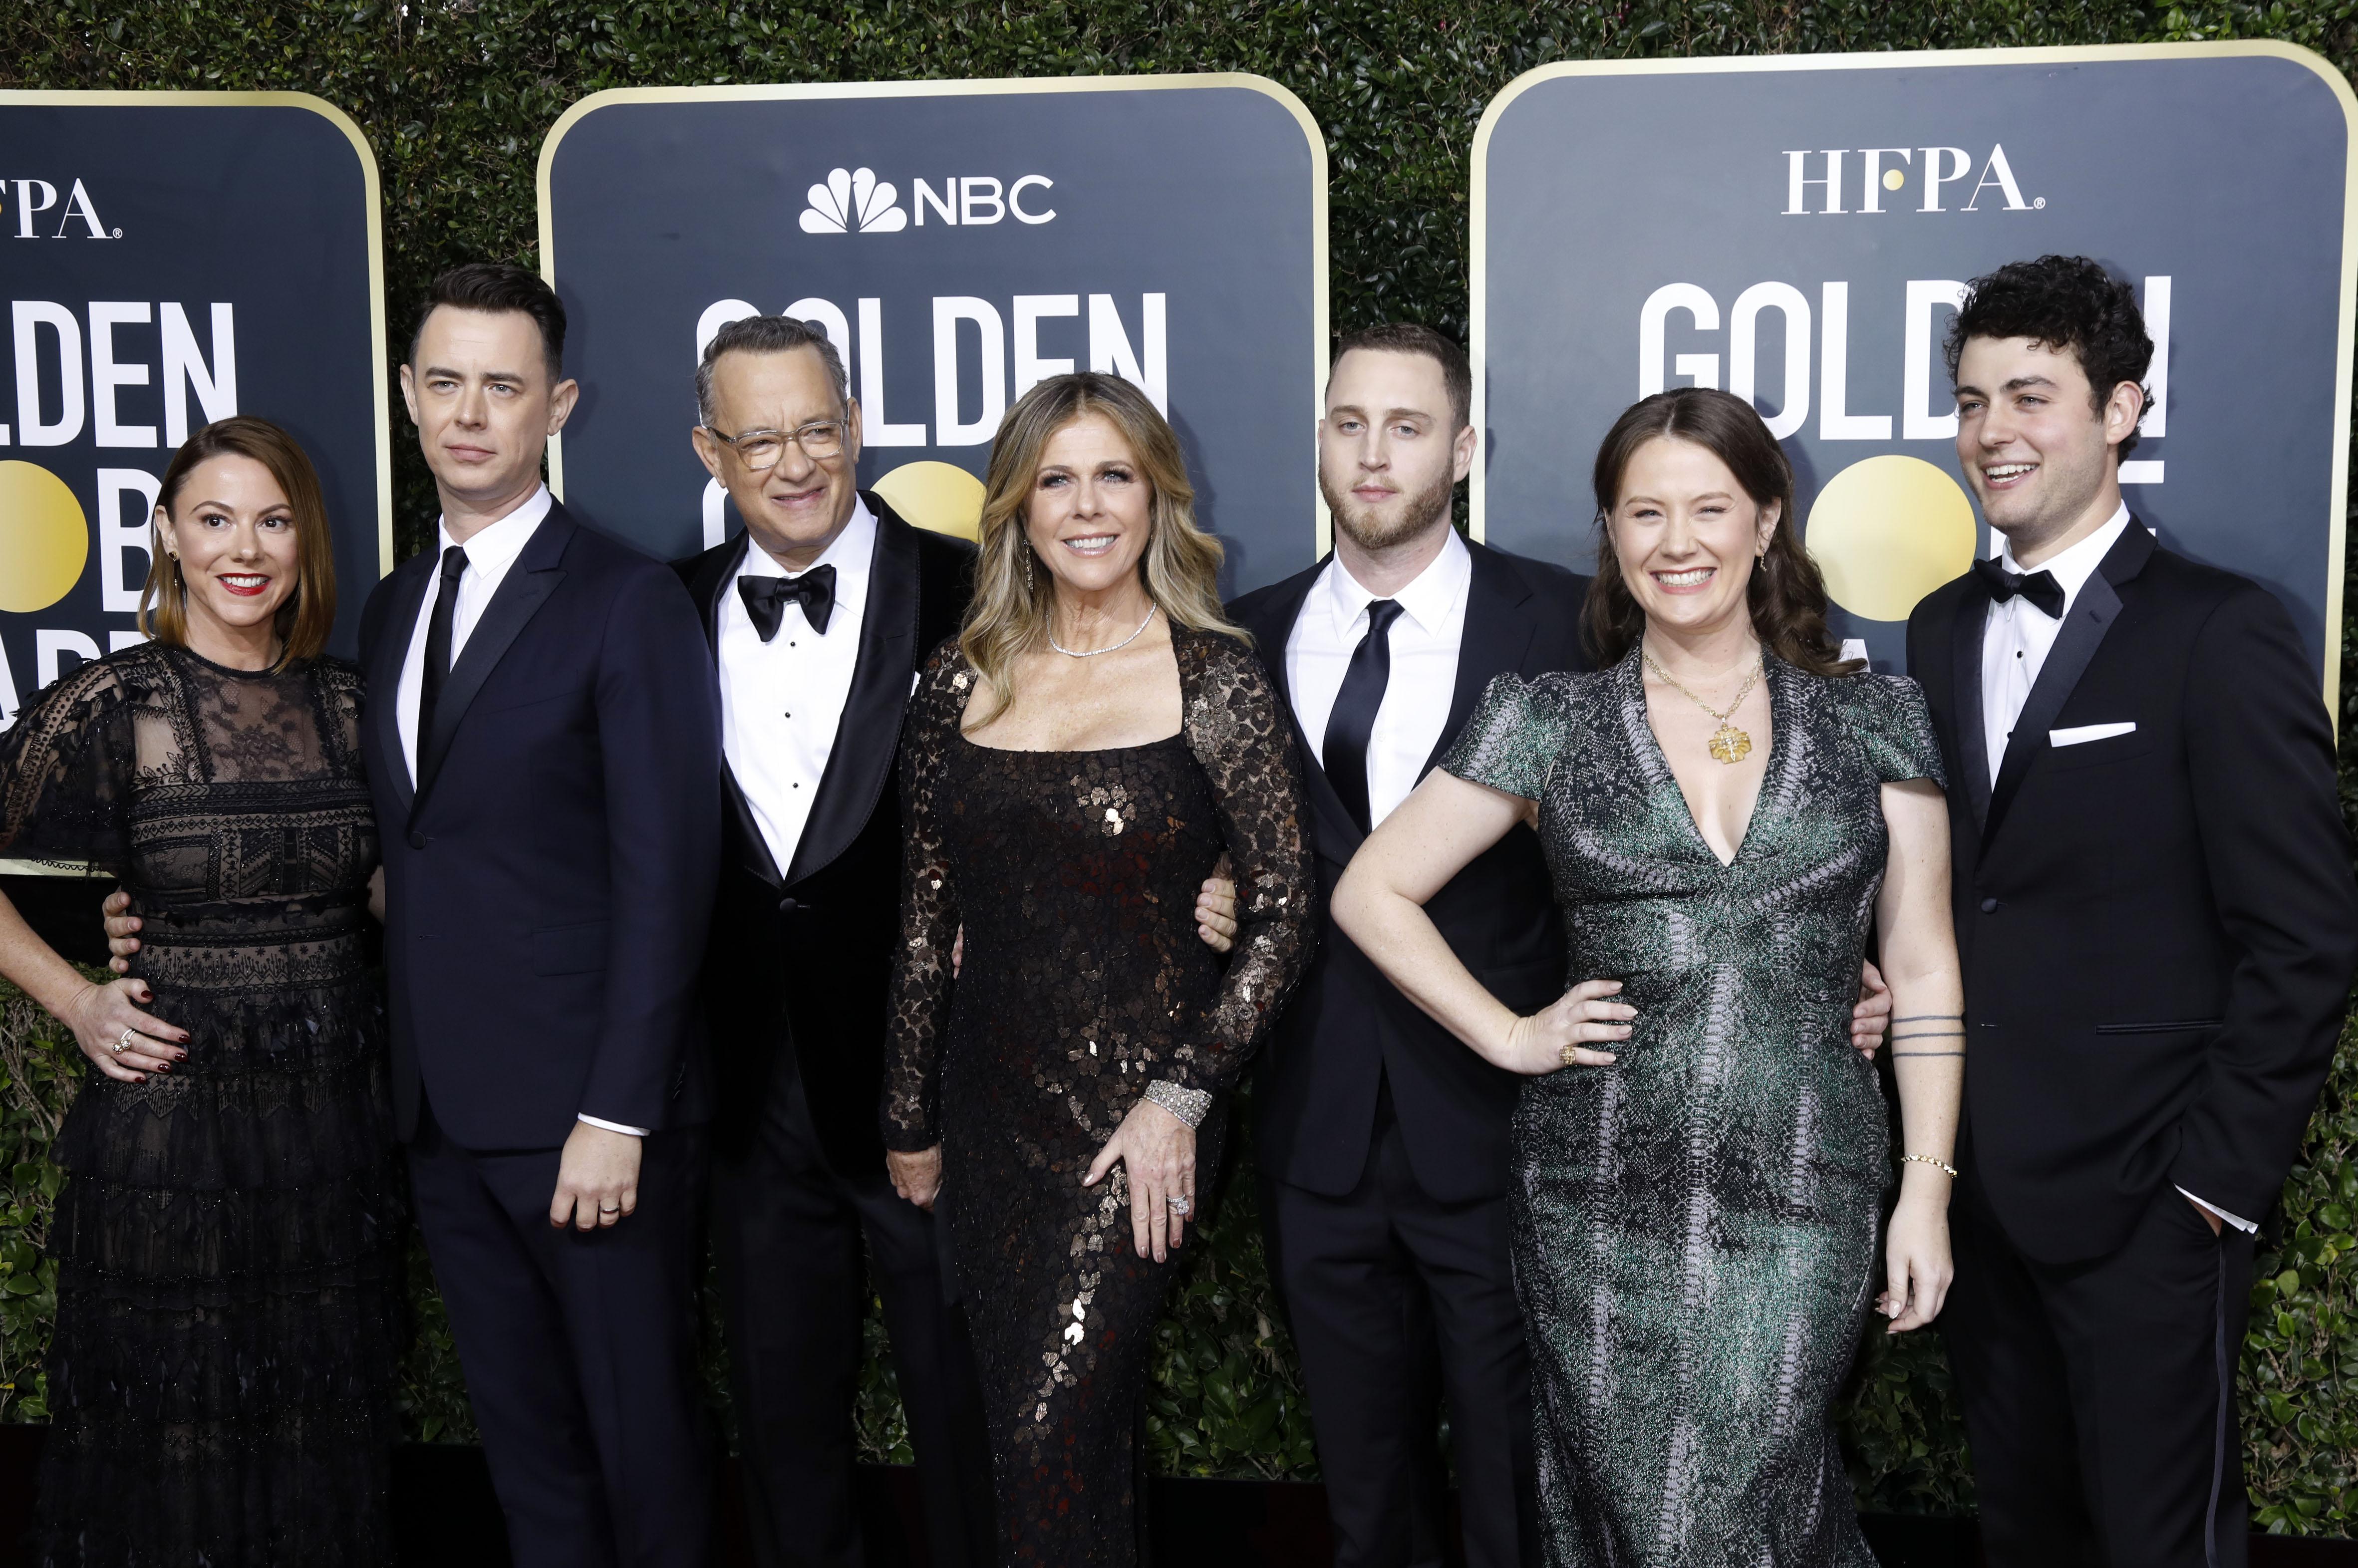 Samantha Bryant, Colin Hanks, Rita Wilson, Tom Hanks, Elizabeth Ann Hanks, Chet Hanks, Truman Theodore Hanks